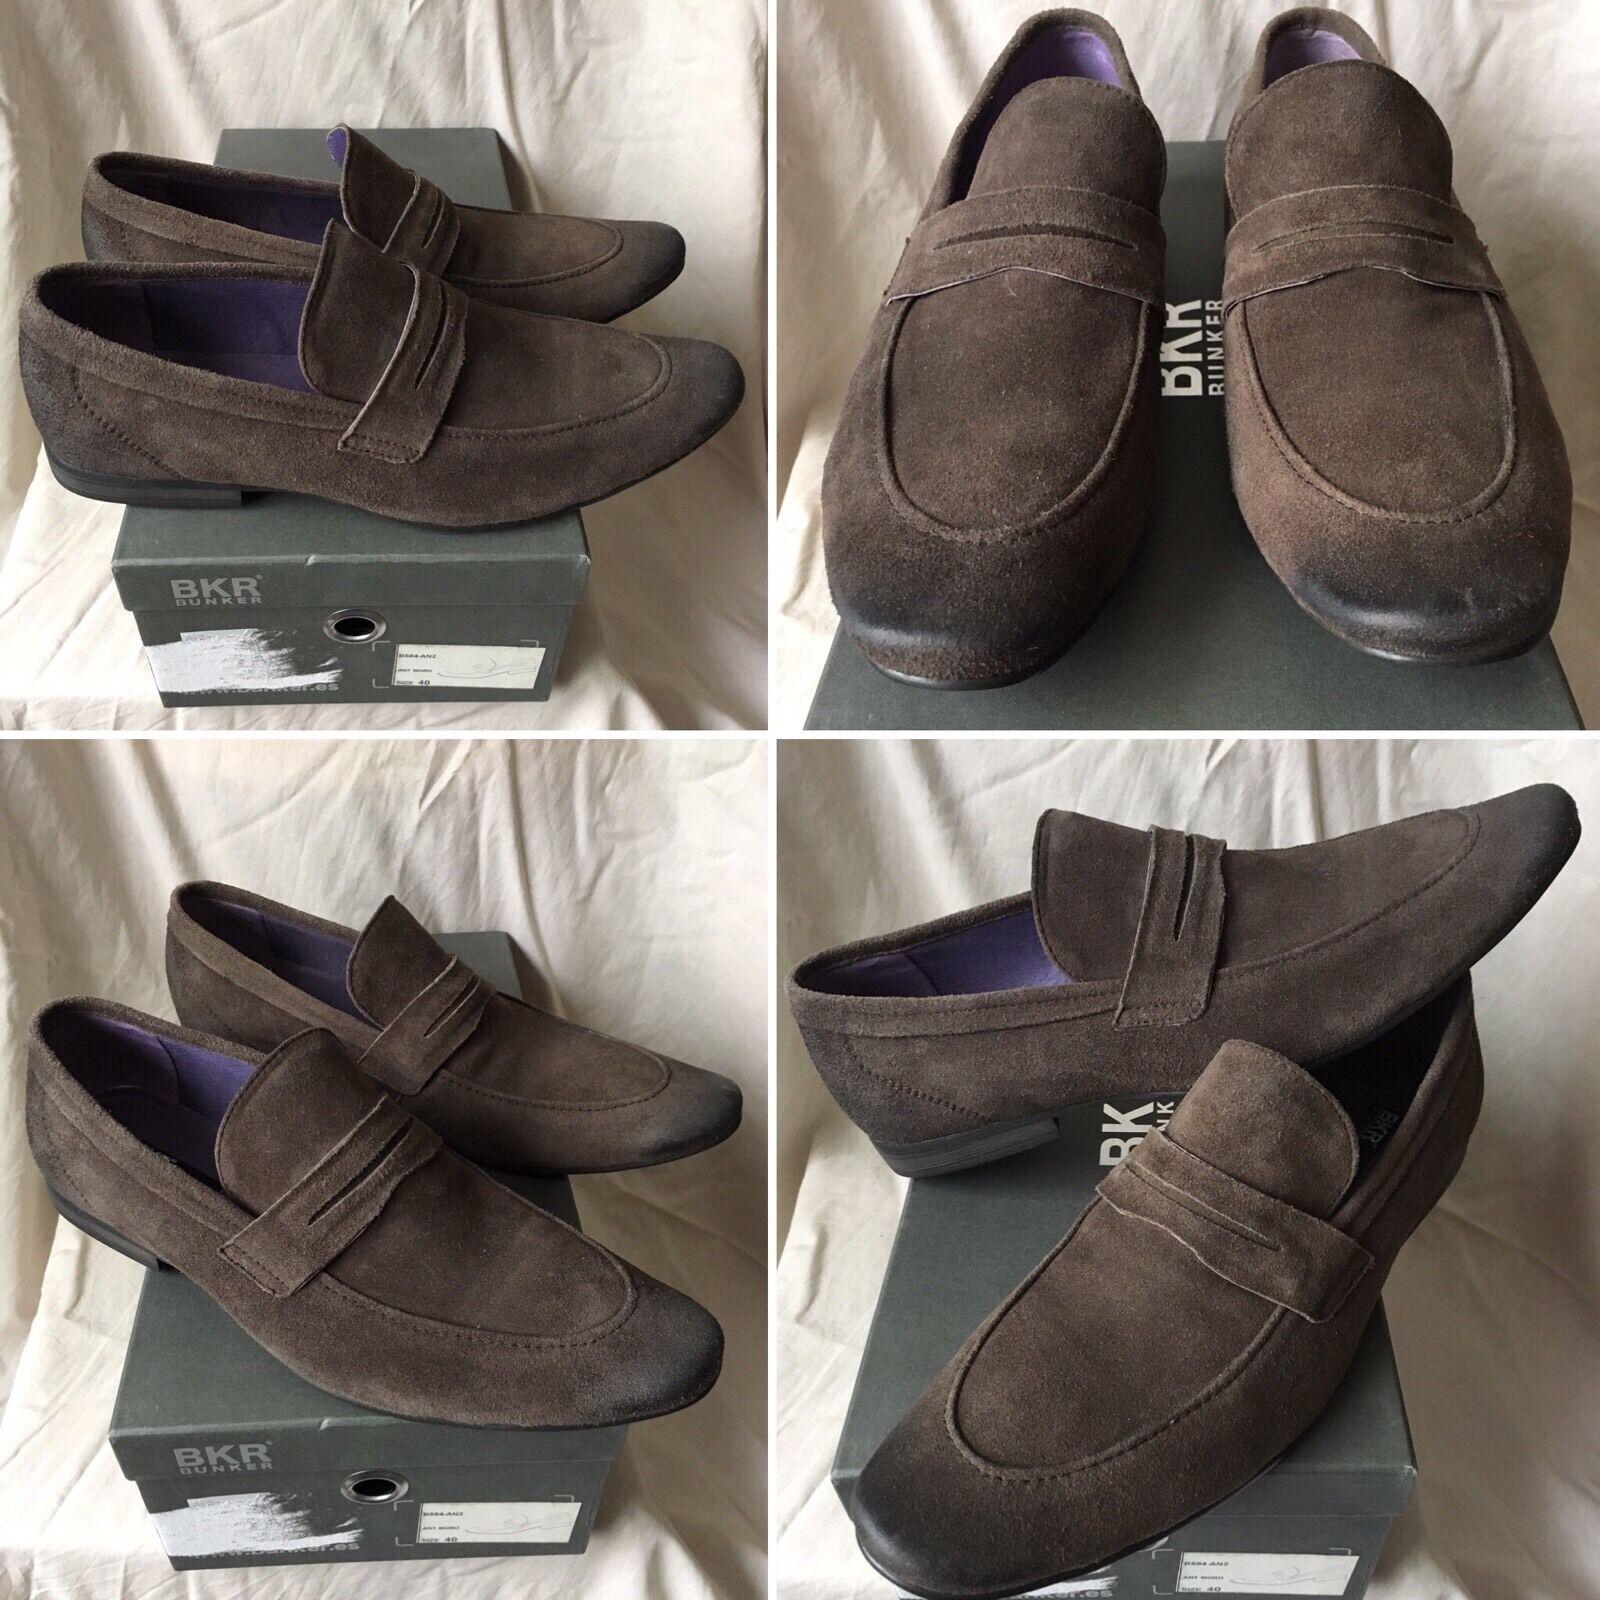 SOLD OUT RARE marrón BUNKER BKR LEATHER MOCASSINS zapatos zapatos  B584 Talla 40